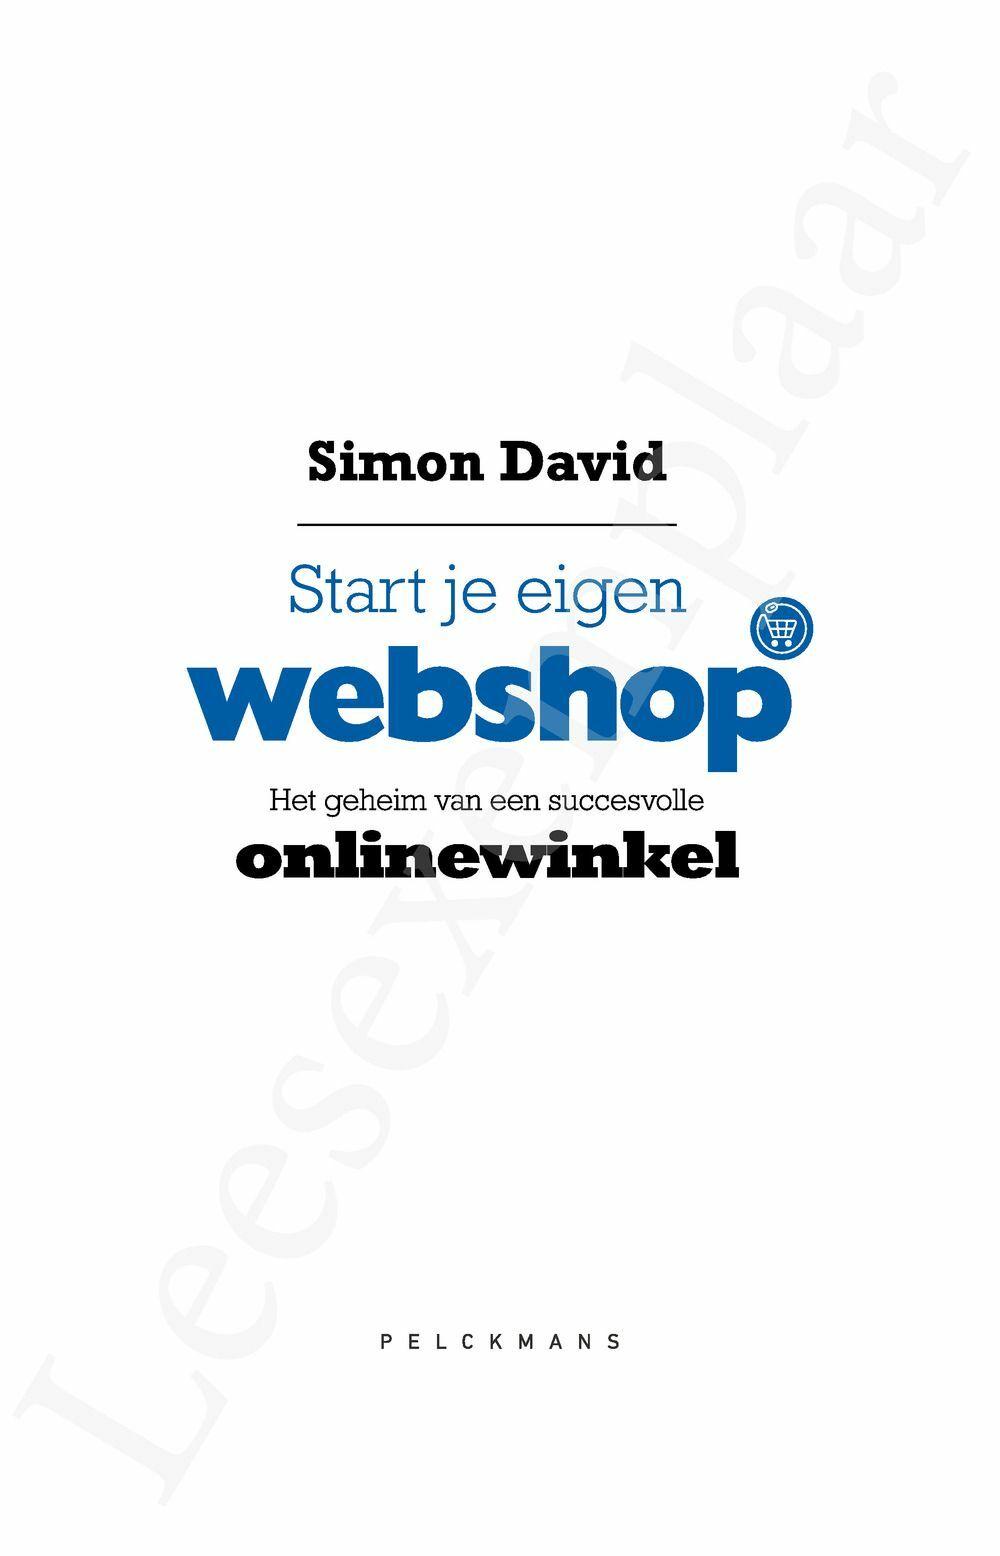 Preview: Start je eigen webshop